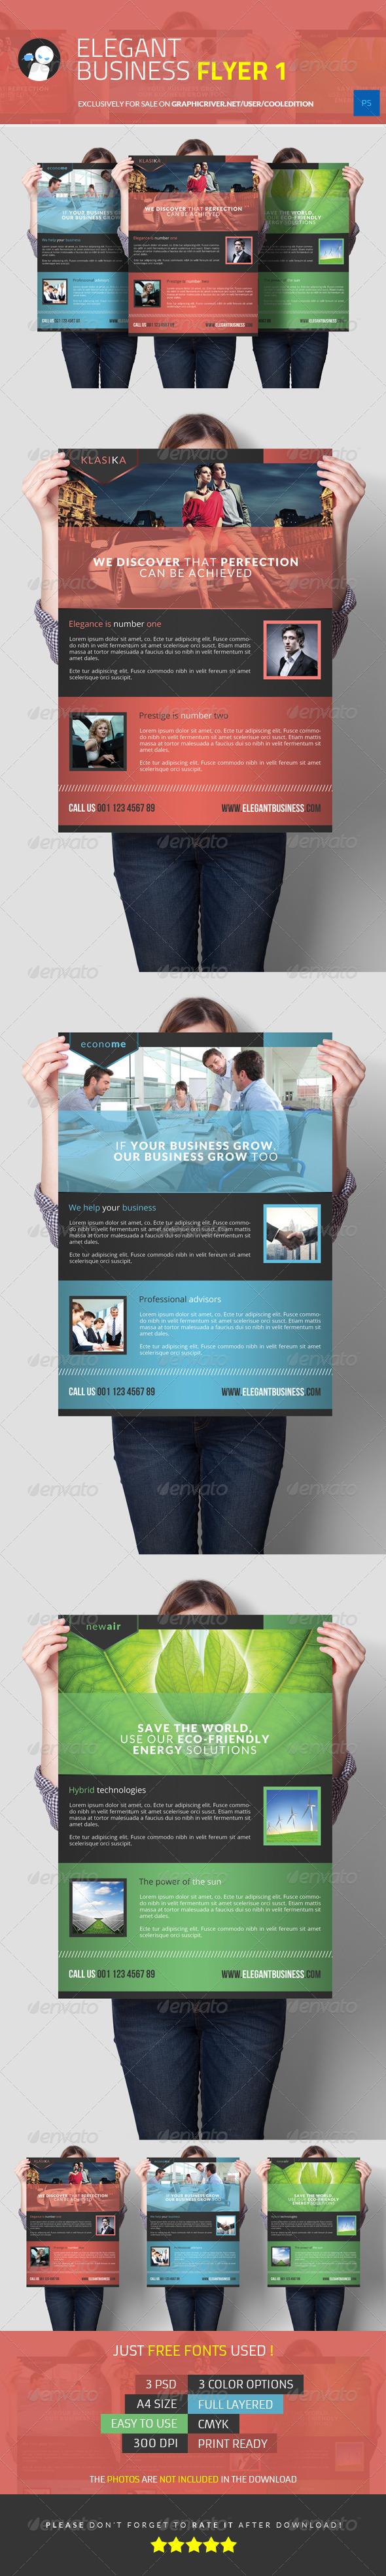 Elegant Business Flyer 1 - Commerce Flyers